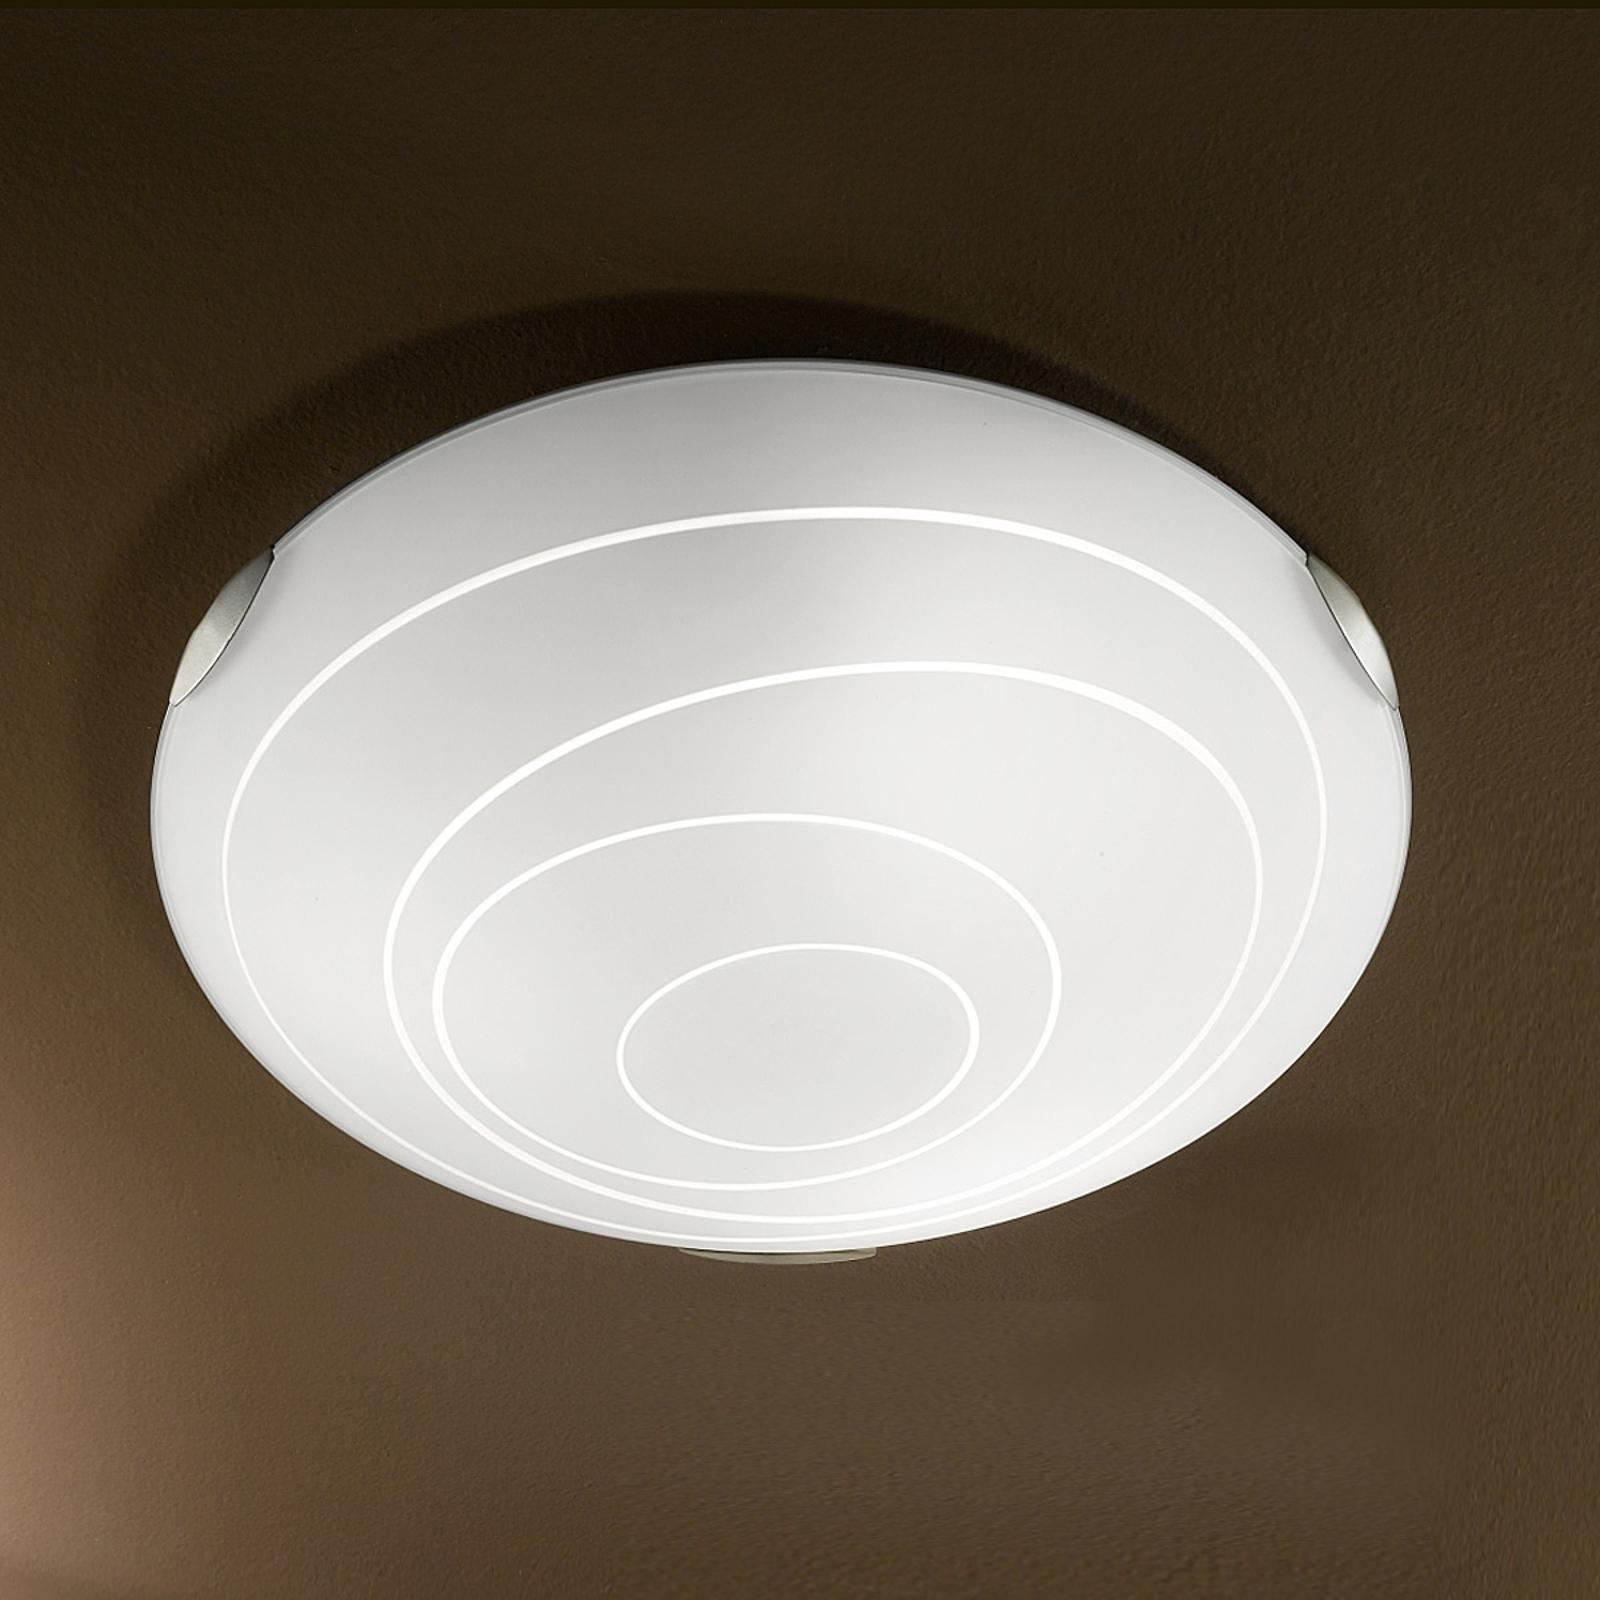 Okrągła lampa sufitowa KENT, biała